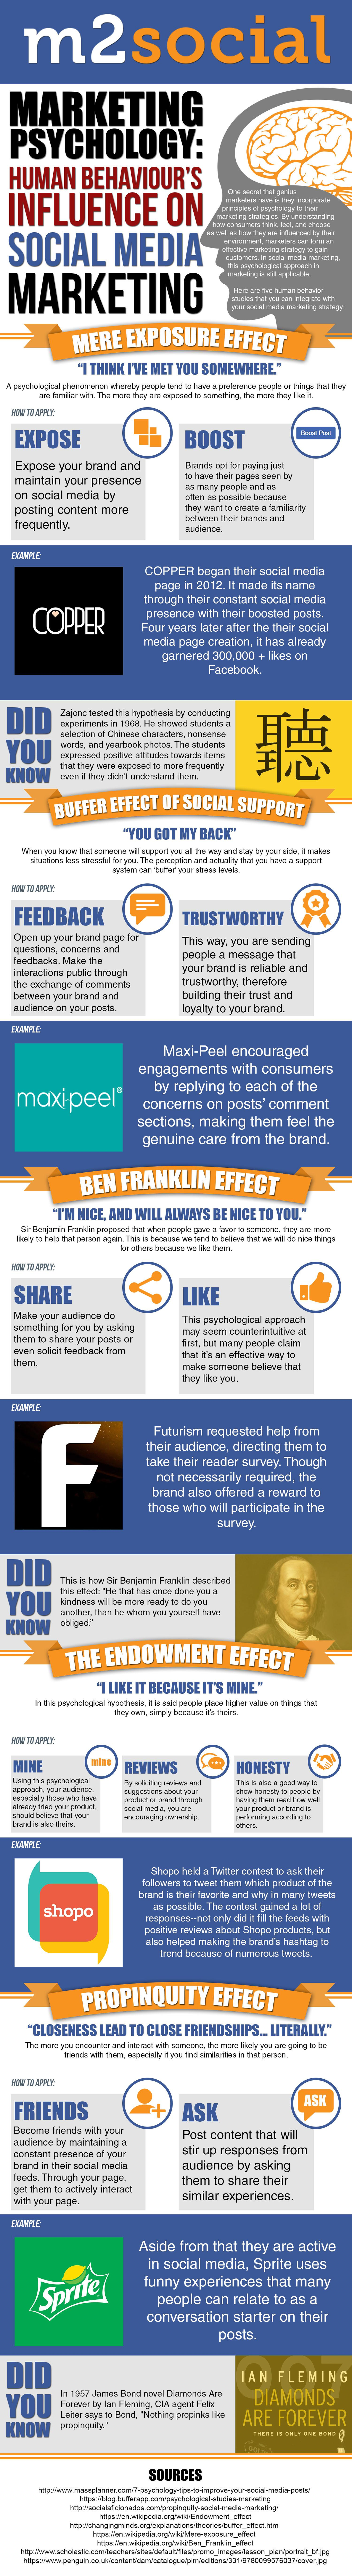 Marketing Psychology: Human Behaviour's Influence on Social Media Marketing